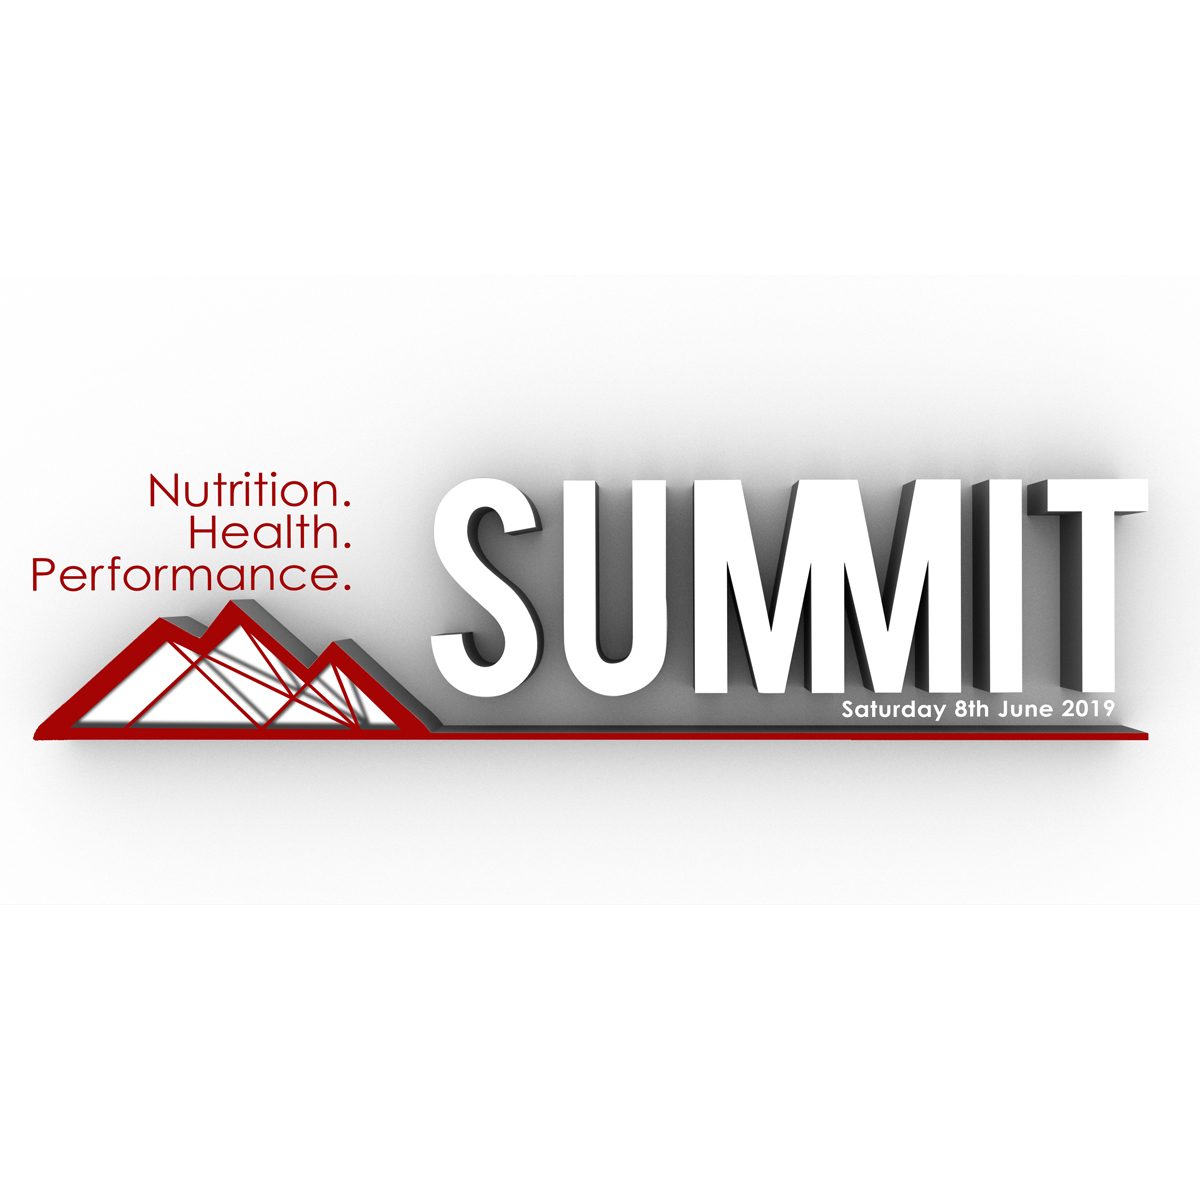 nutrition health performance summit